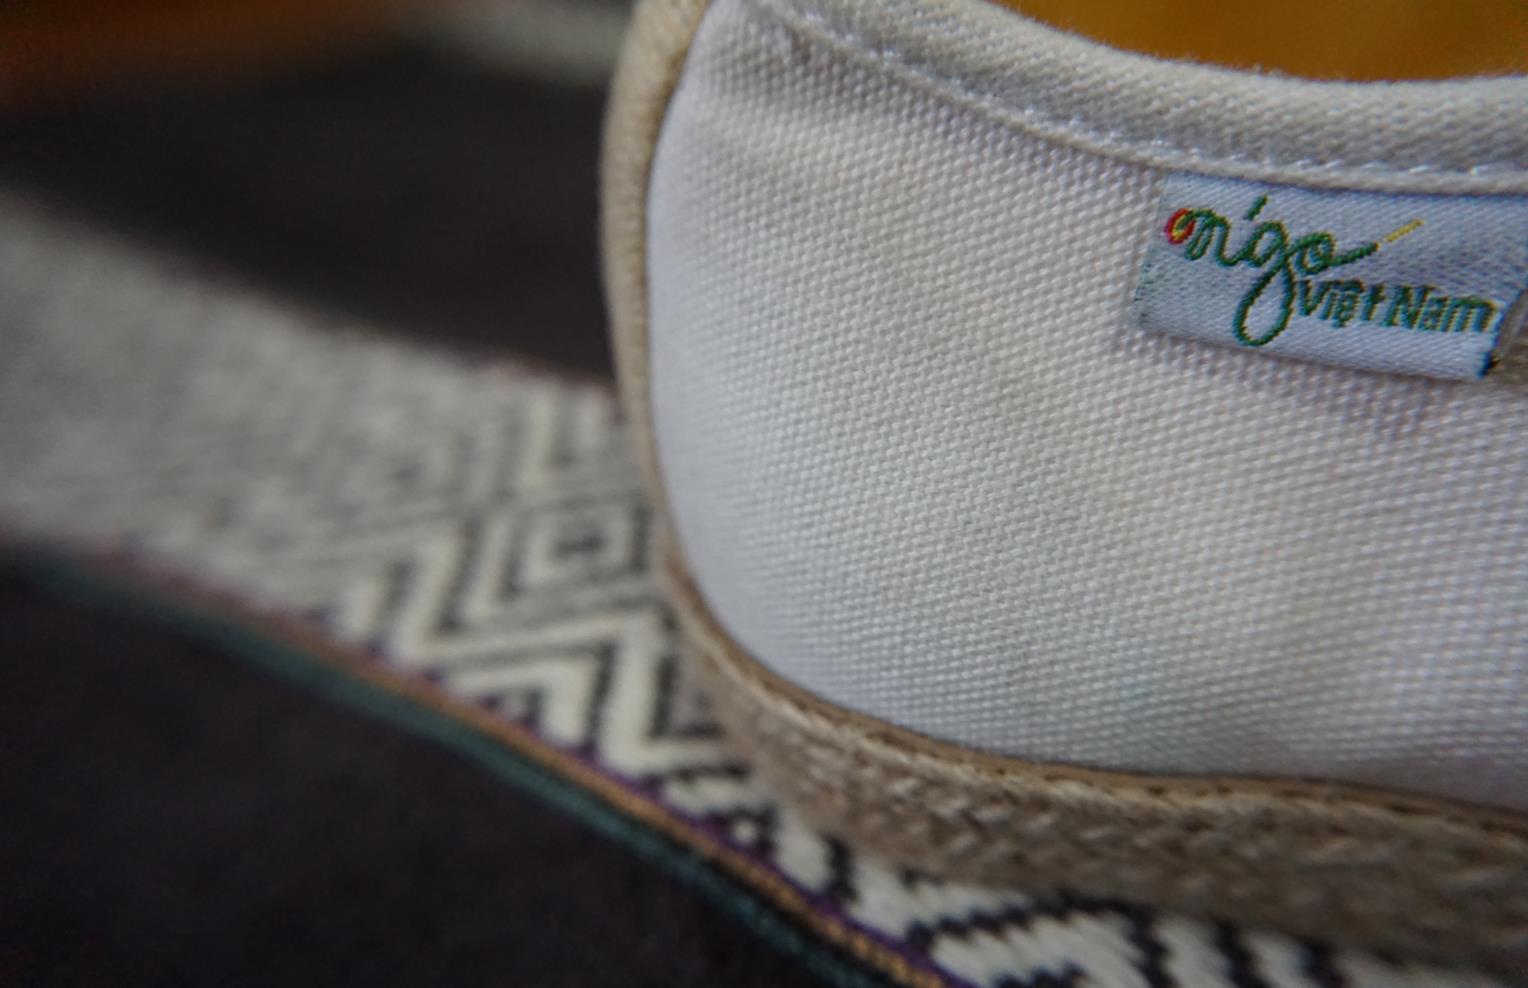 NGO Shoes - baskets - Vietnam - 19